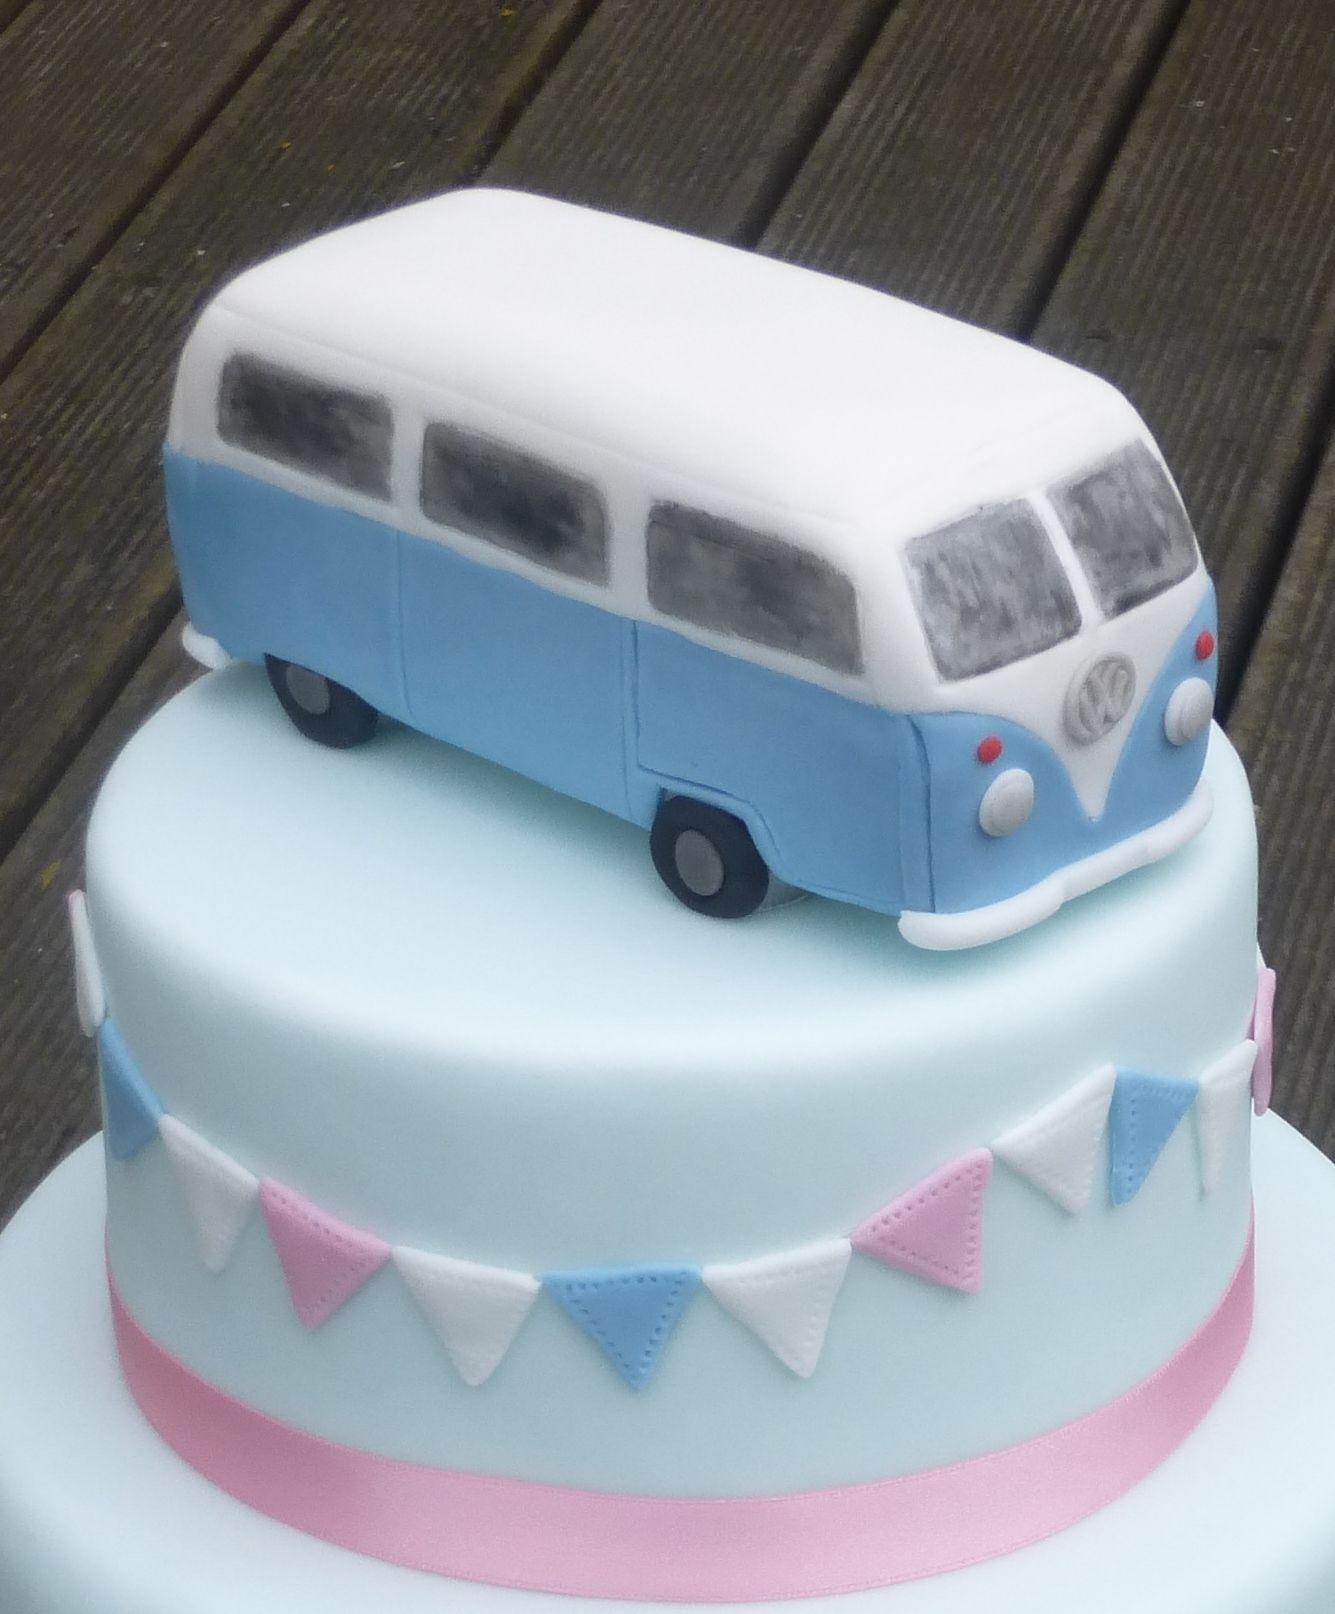 close   vw camper van wedding cake topper    rice crispy treats  cover